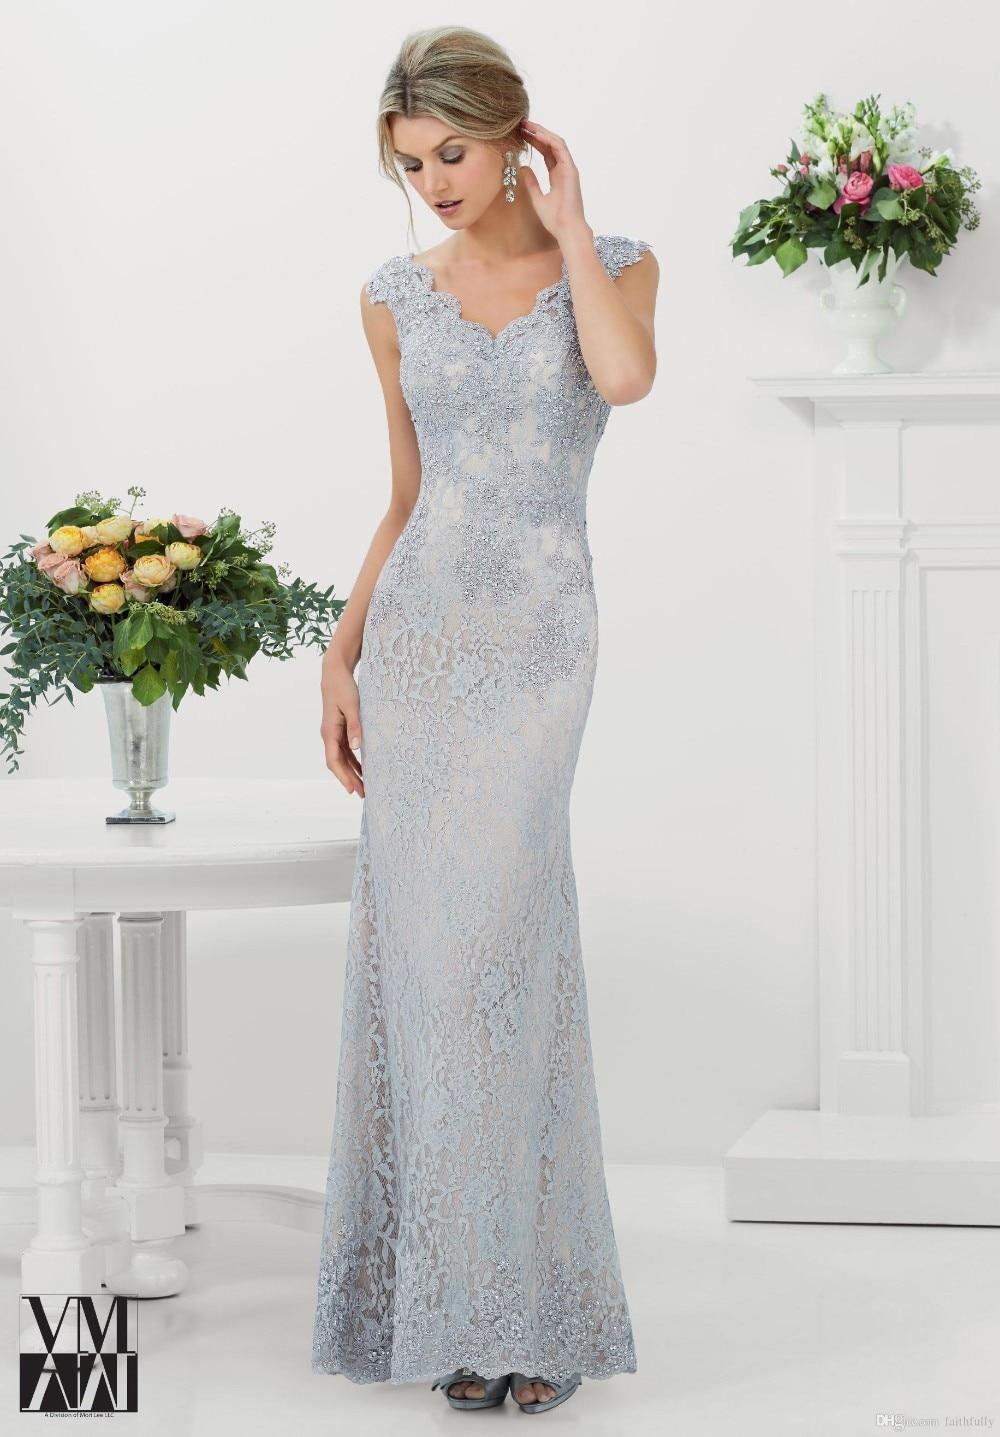 2015 Mermaid Evening Dresses Scalloped Silver Lace Applique Capped Appliques Gowns Arabic Vestidos Button